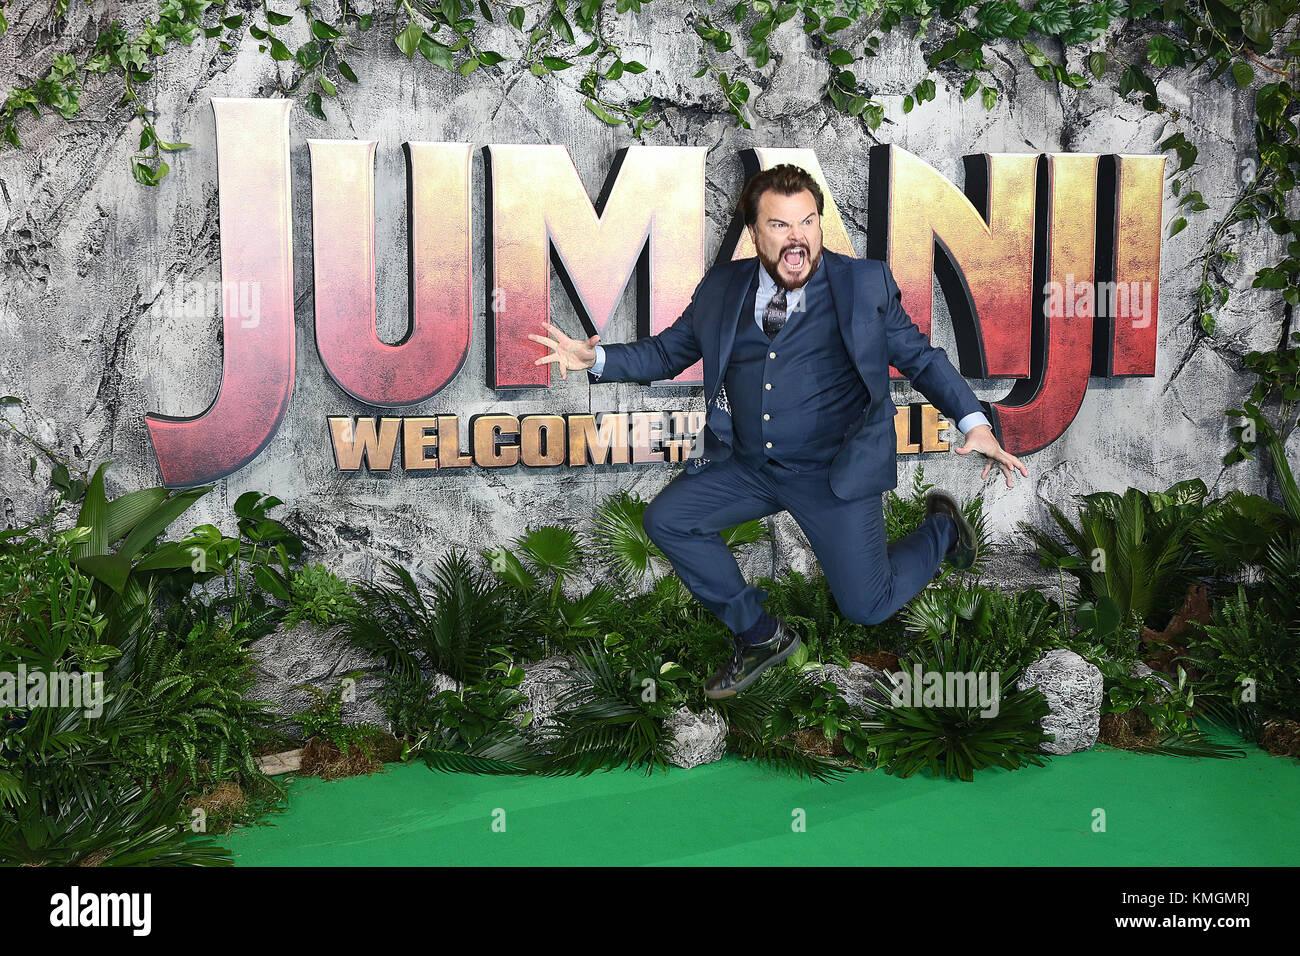 London, UK. 7th December, 2017. Jack Black, Jumanji: Welcome to the Jungle - UK Premiere, Leicester Square, London, - Stock Image